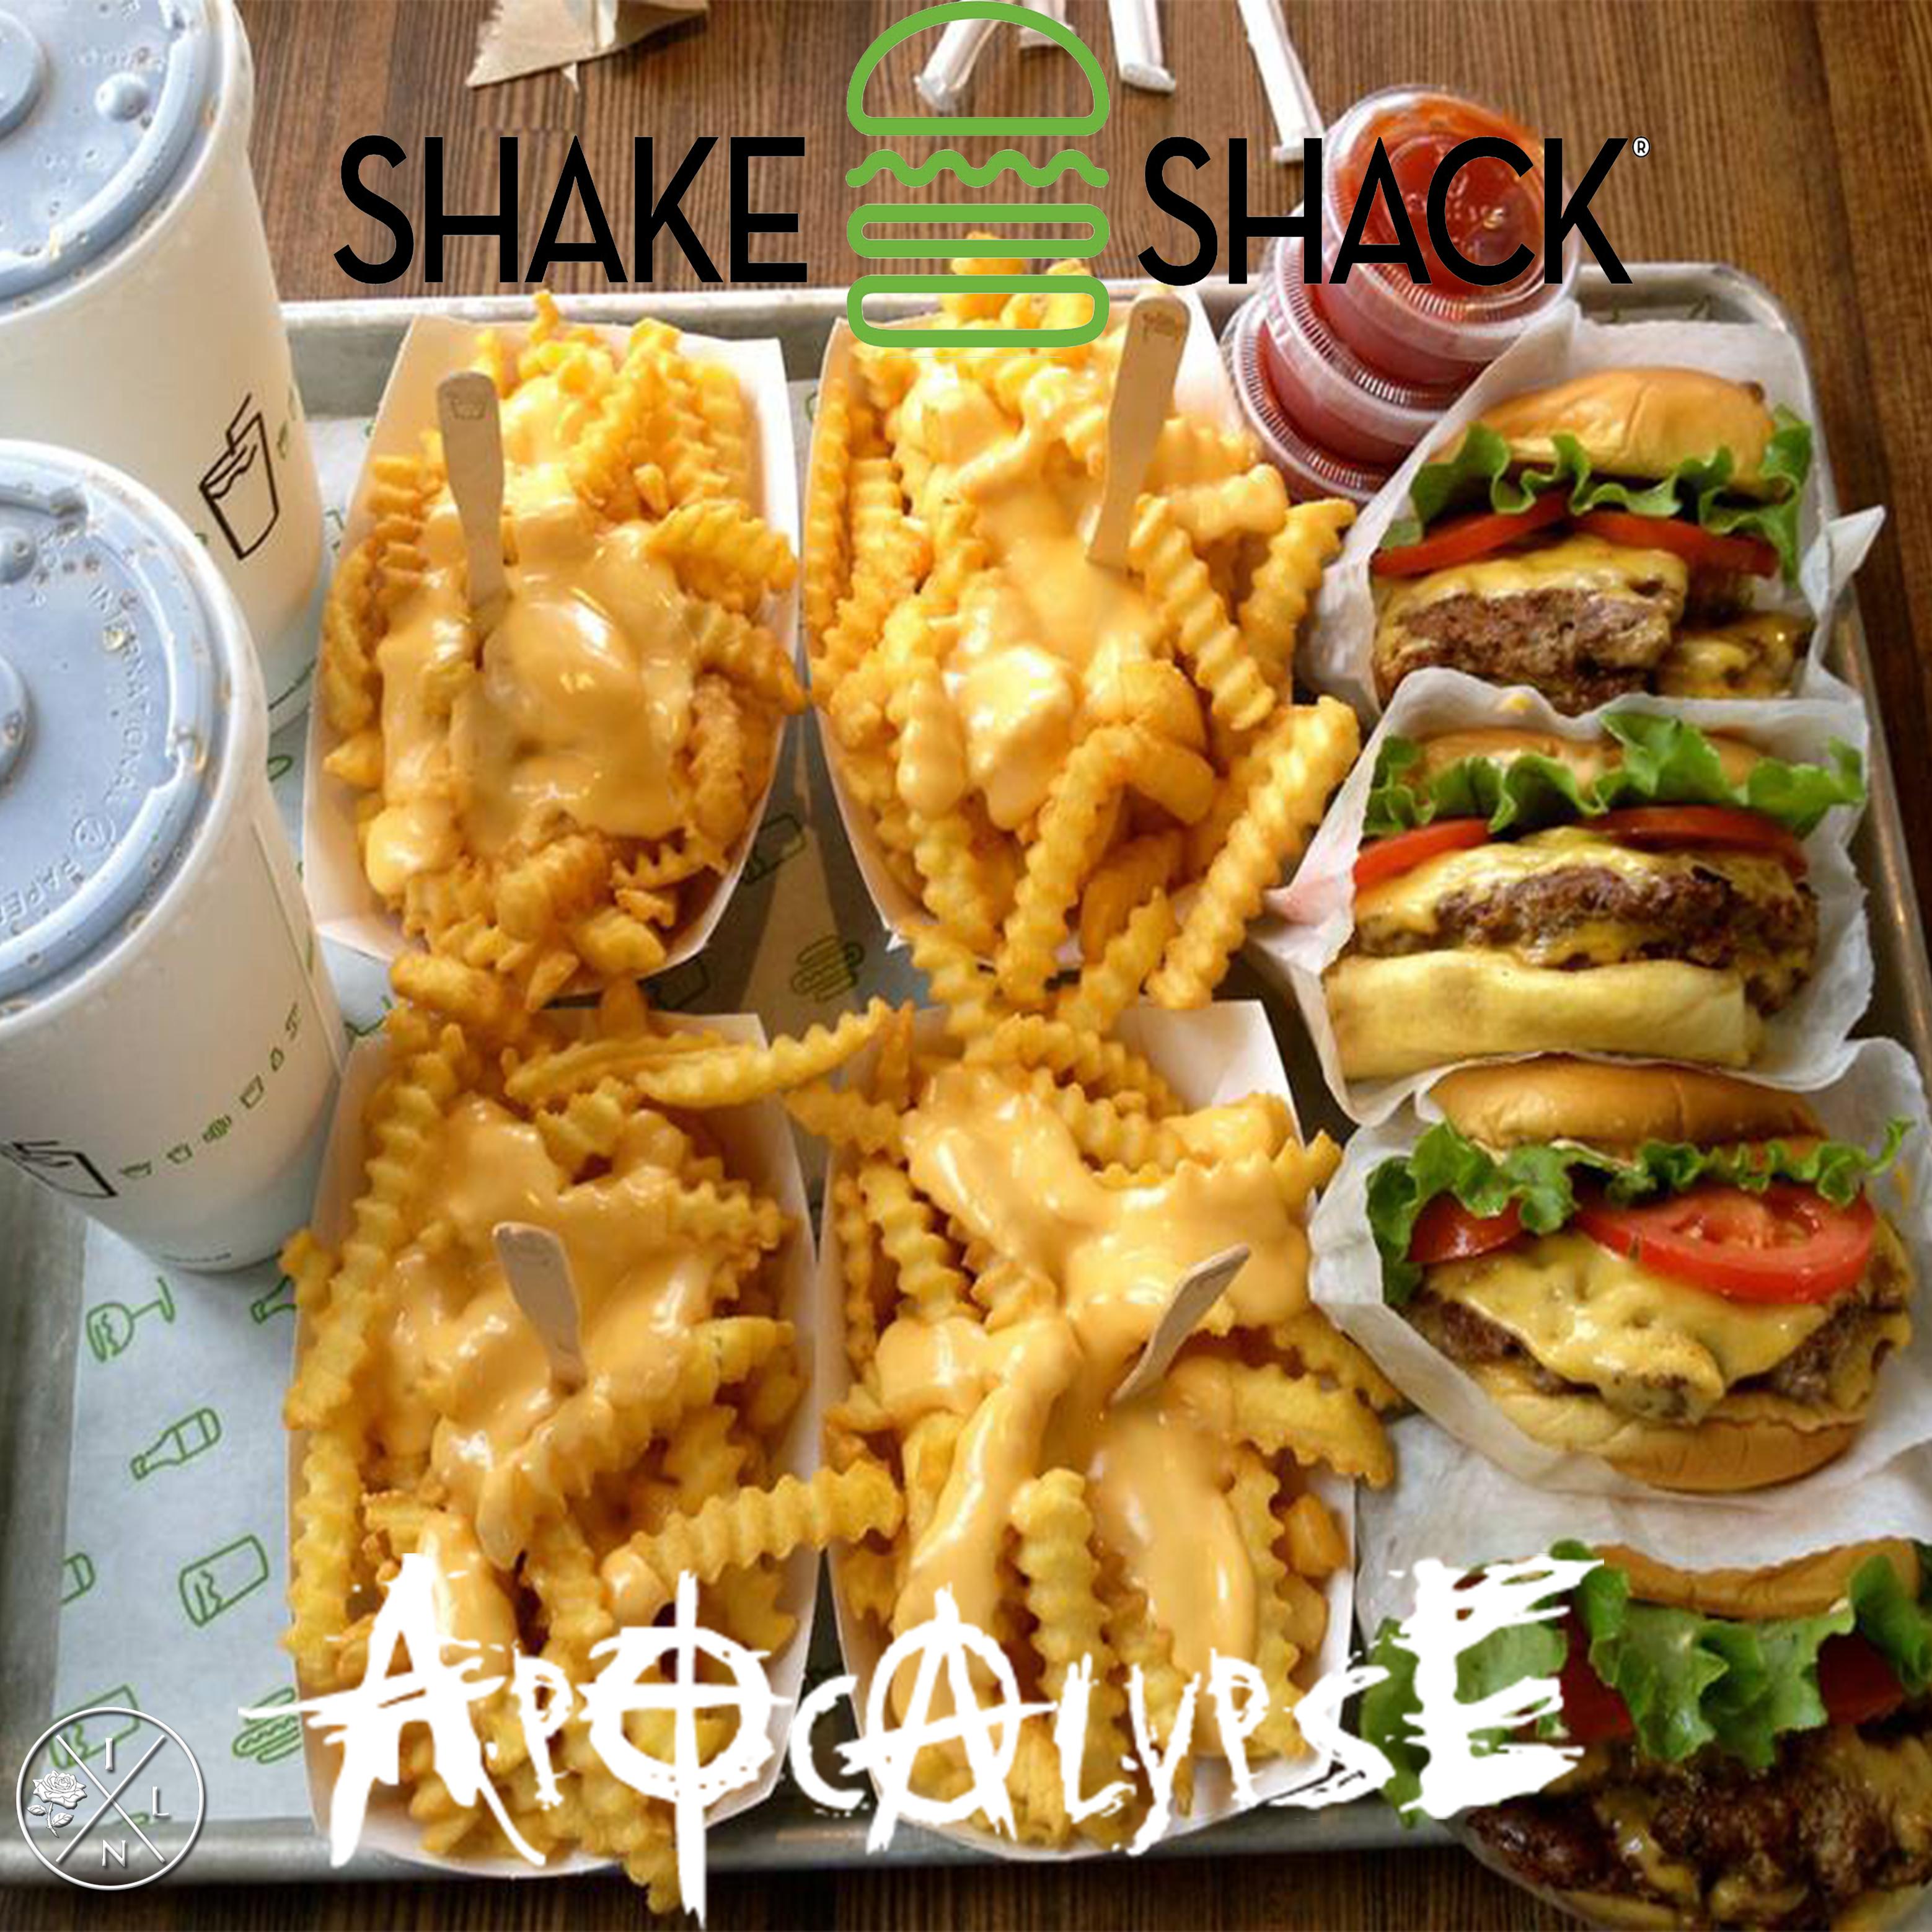 [NEWS]: Shake Shack Apocalypse